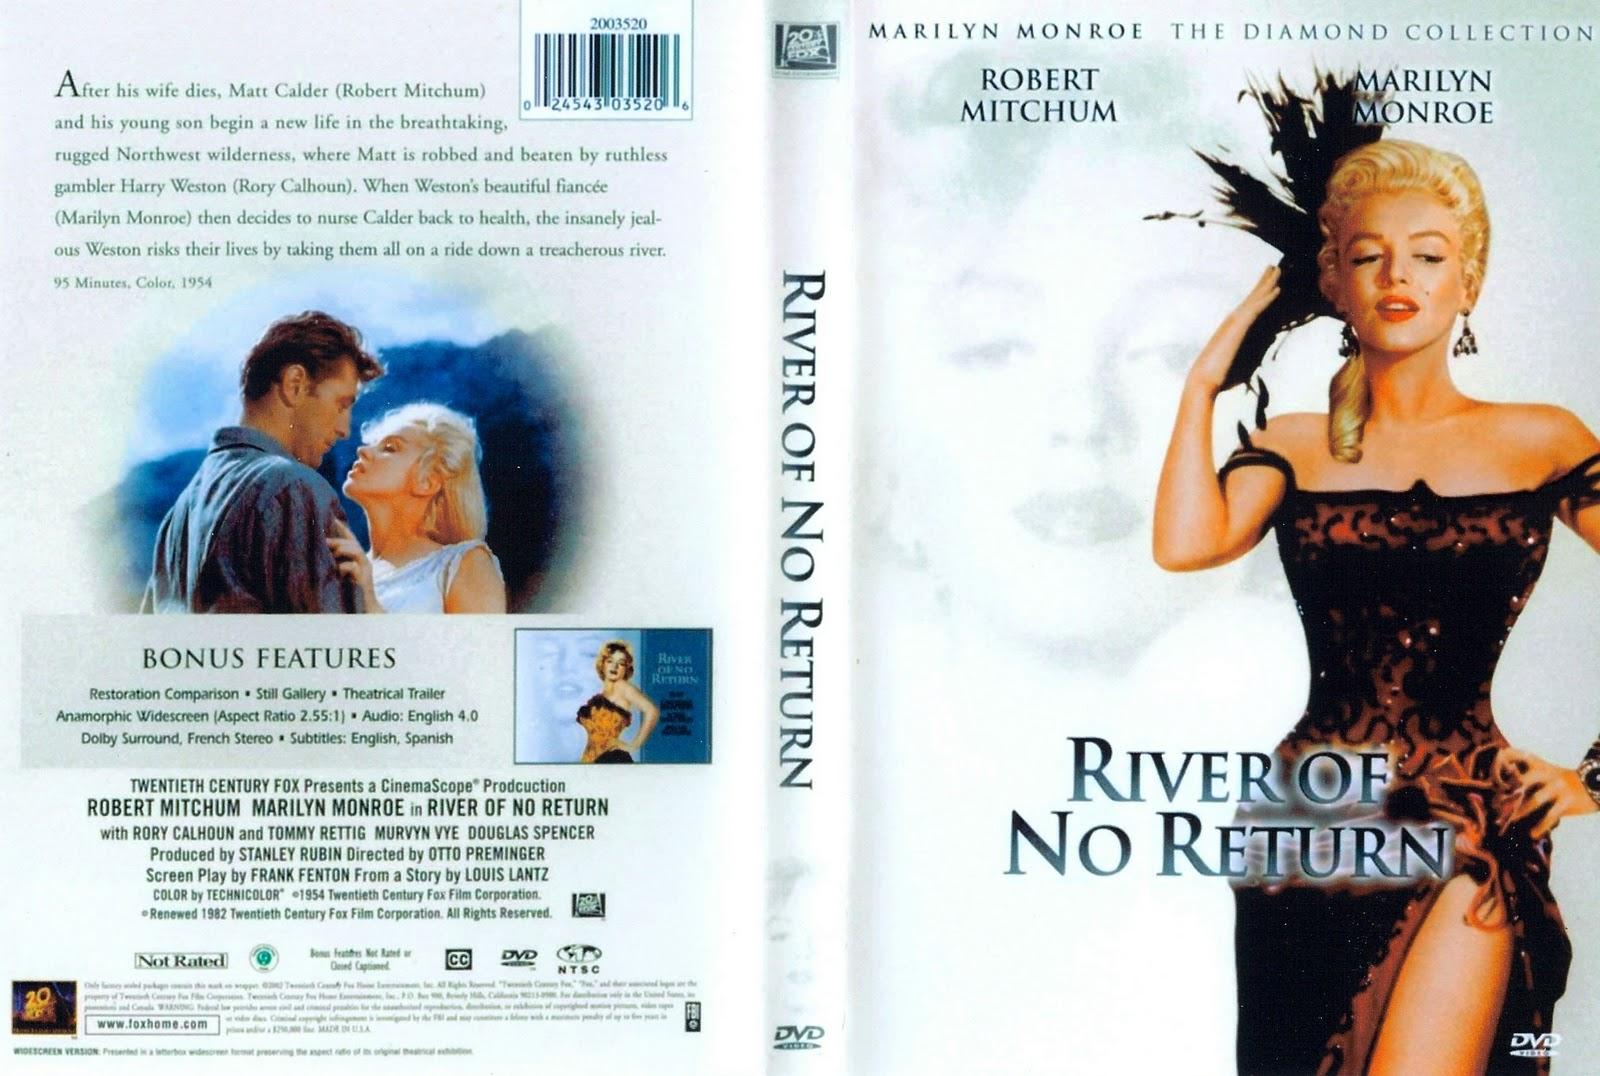 http://4.bp.blogspot.com/_tE7pxorPqL4/TSWOcg0h74I/AAAAAAAAAb0/Jsi5H5vy5jY/s1600/River+of+No+Return+FRONT1.jpg